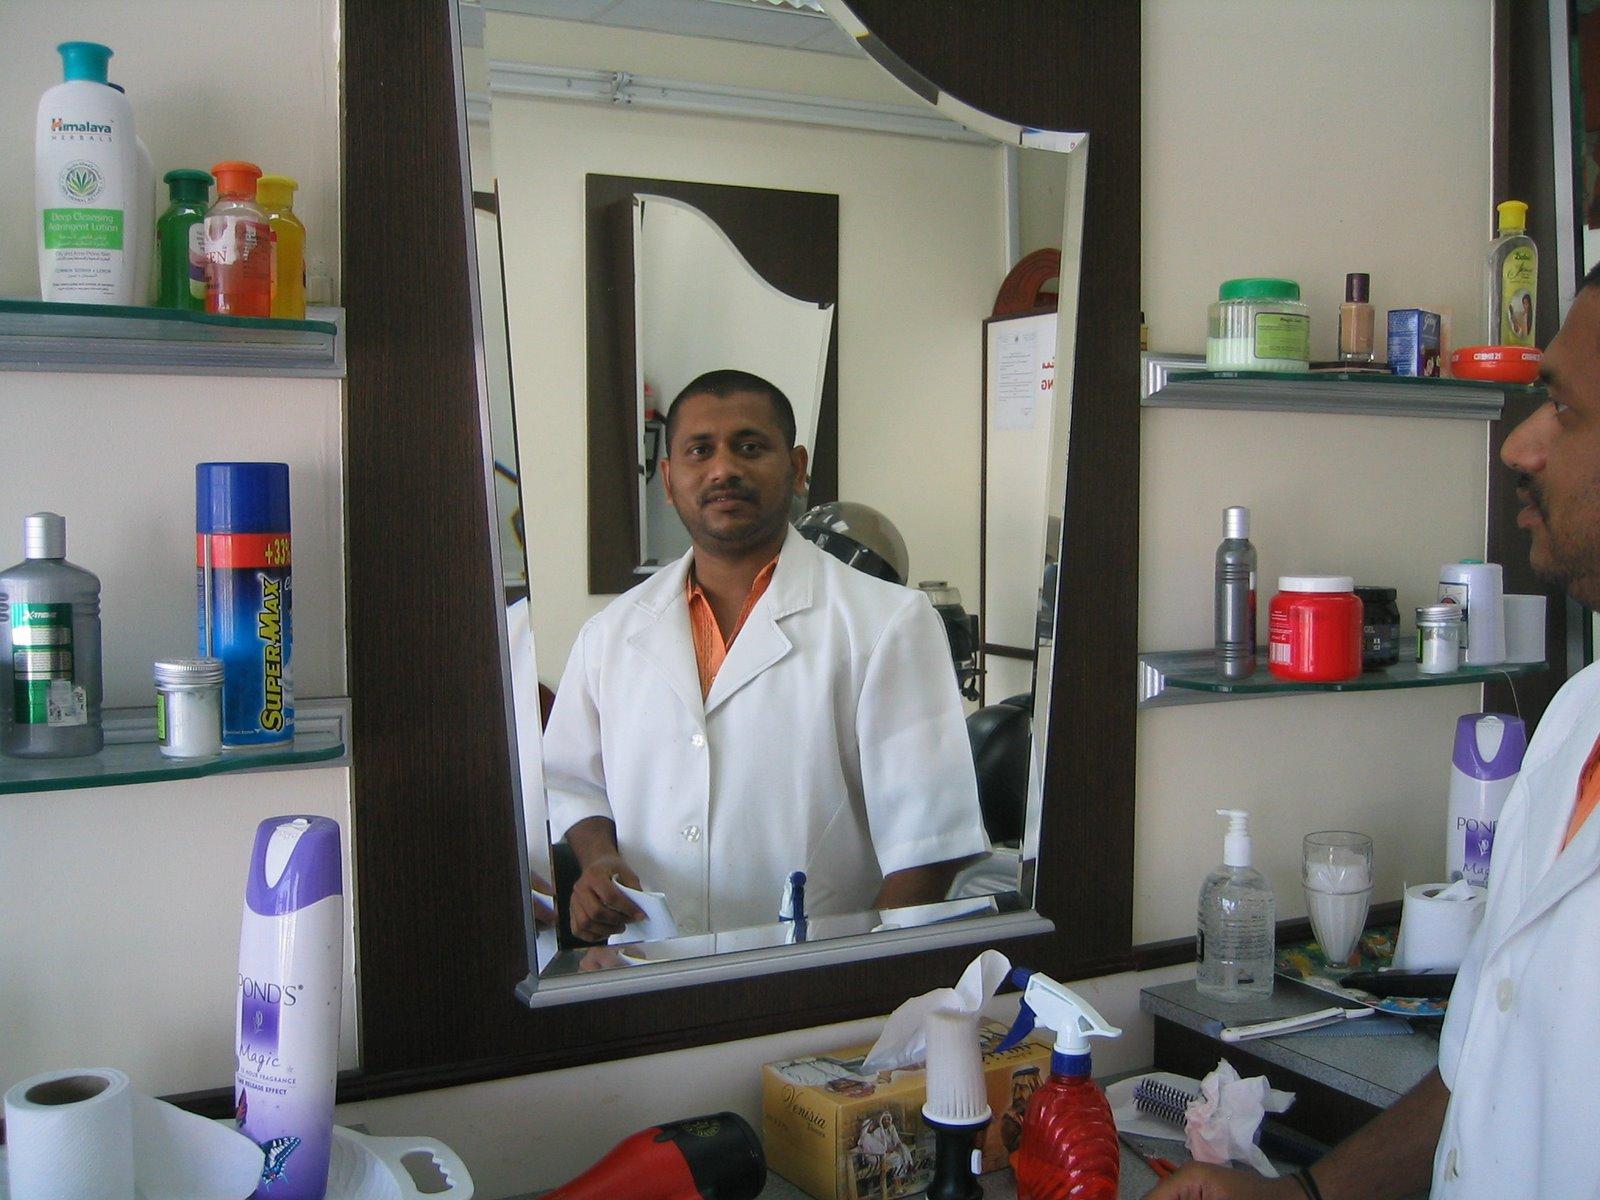 [barber]